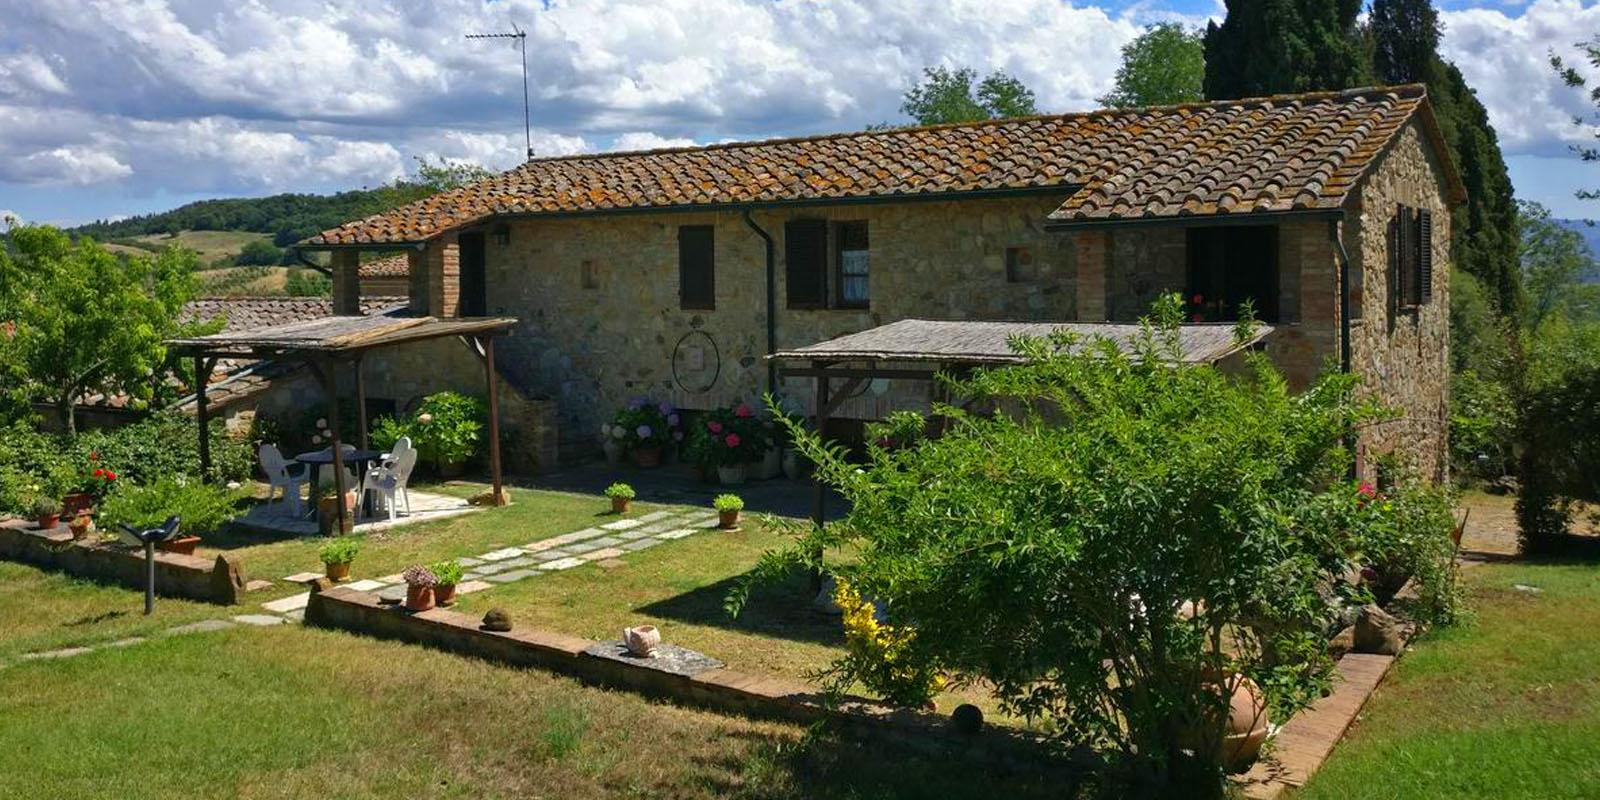 Agriturismo Toscana Casole d'Elsa Grecinella – Tuscany Italy